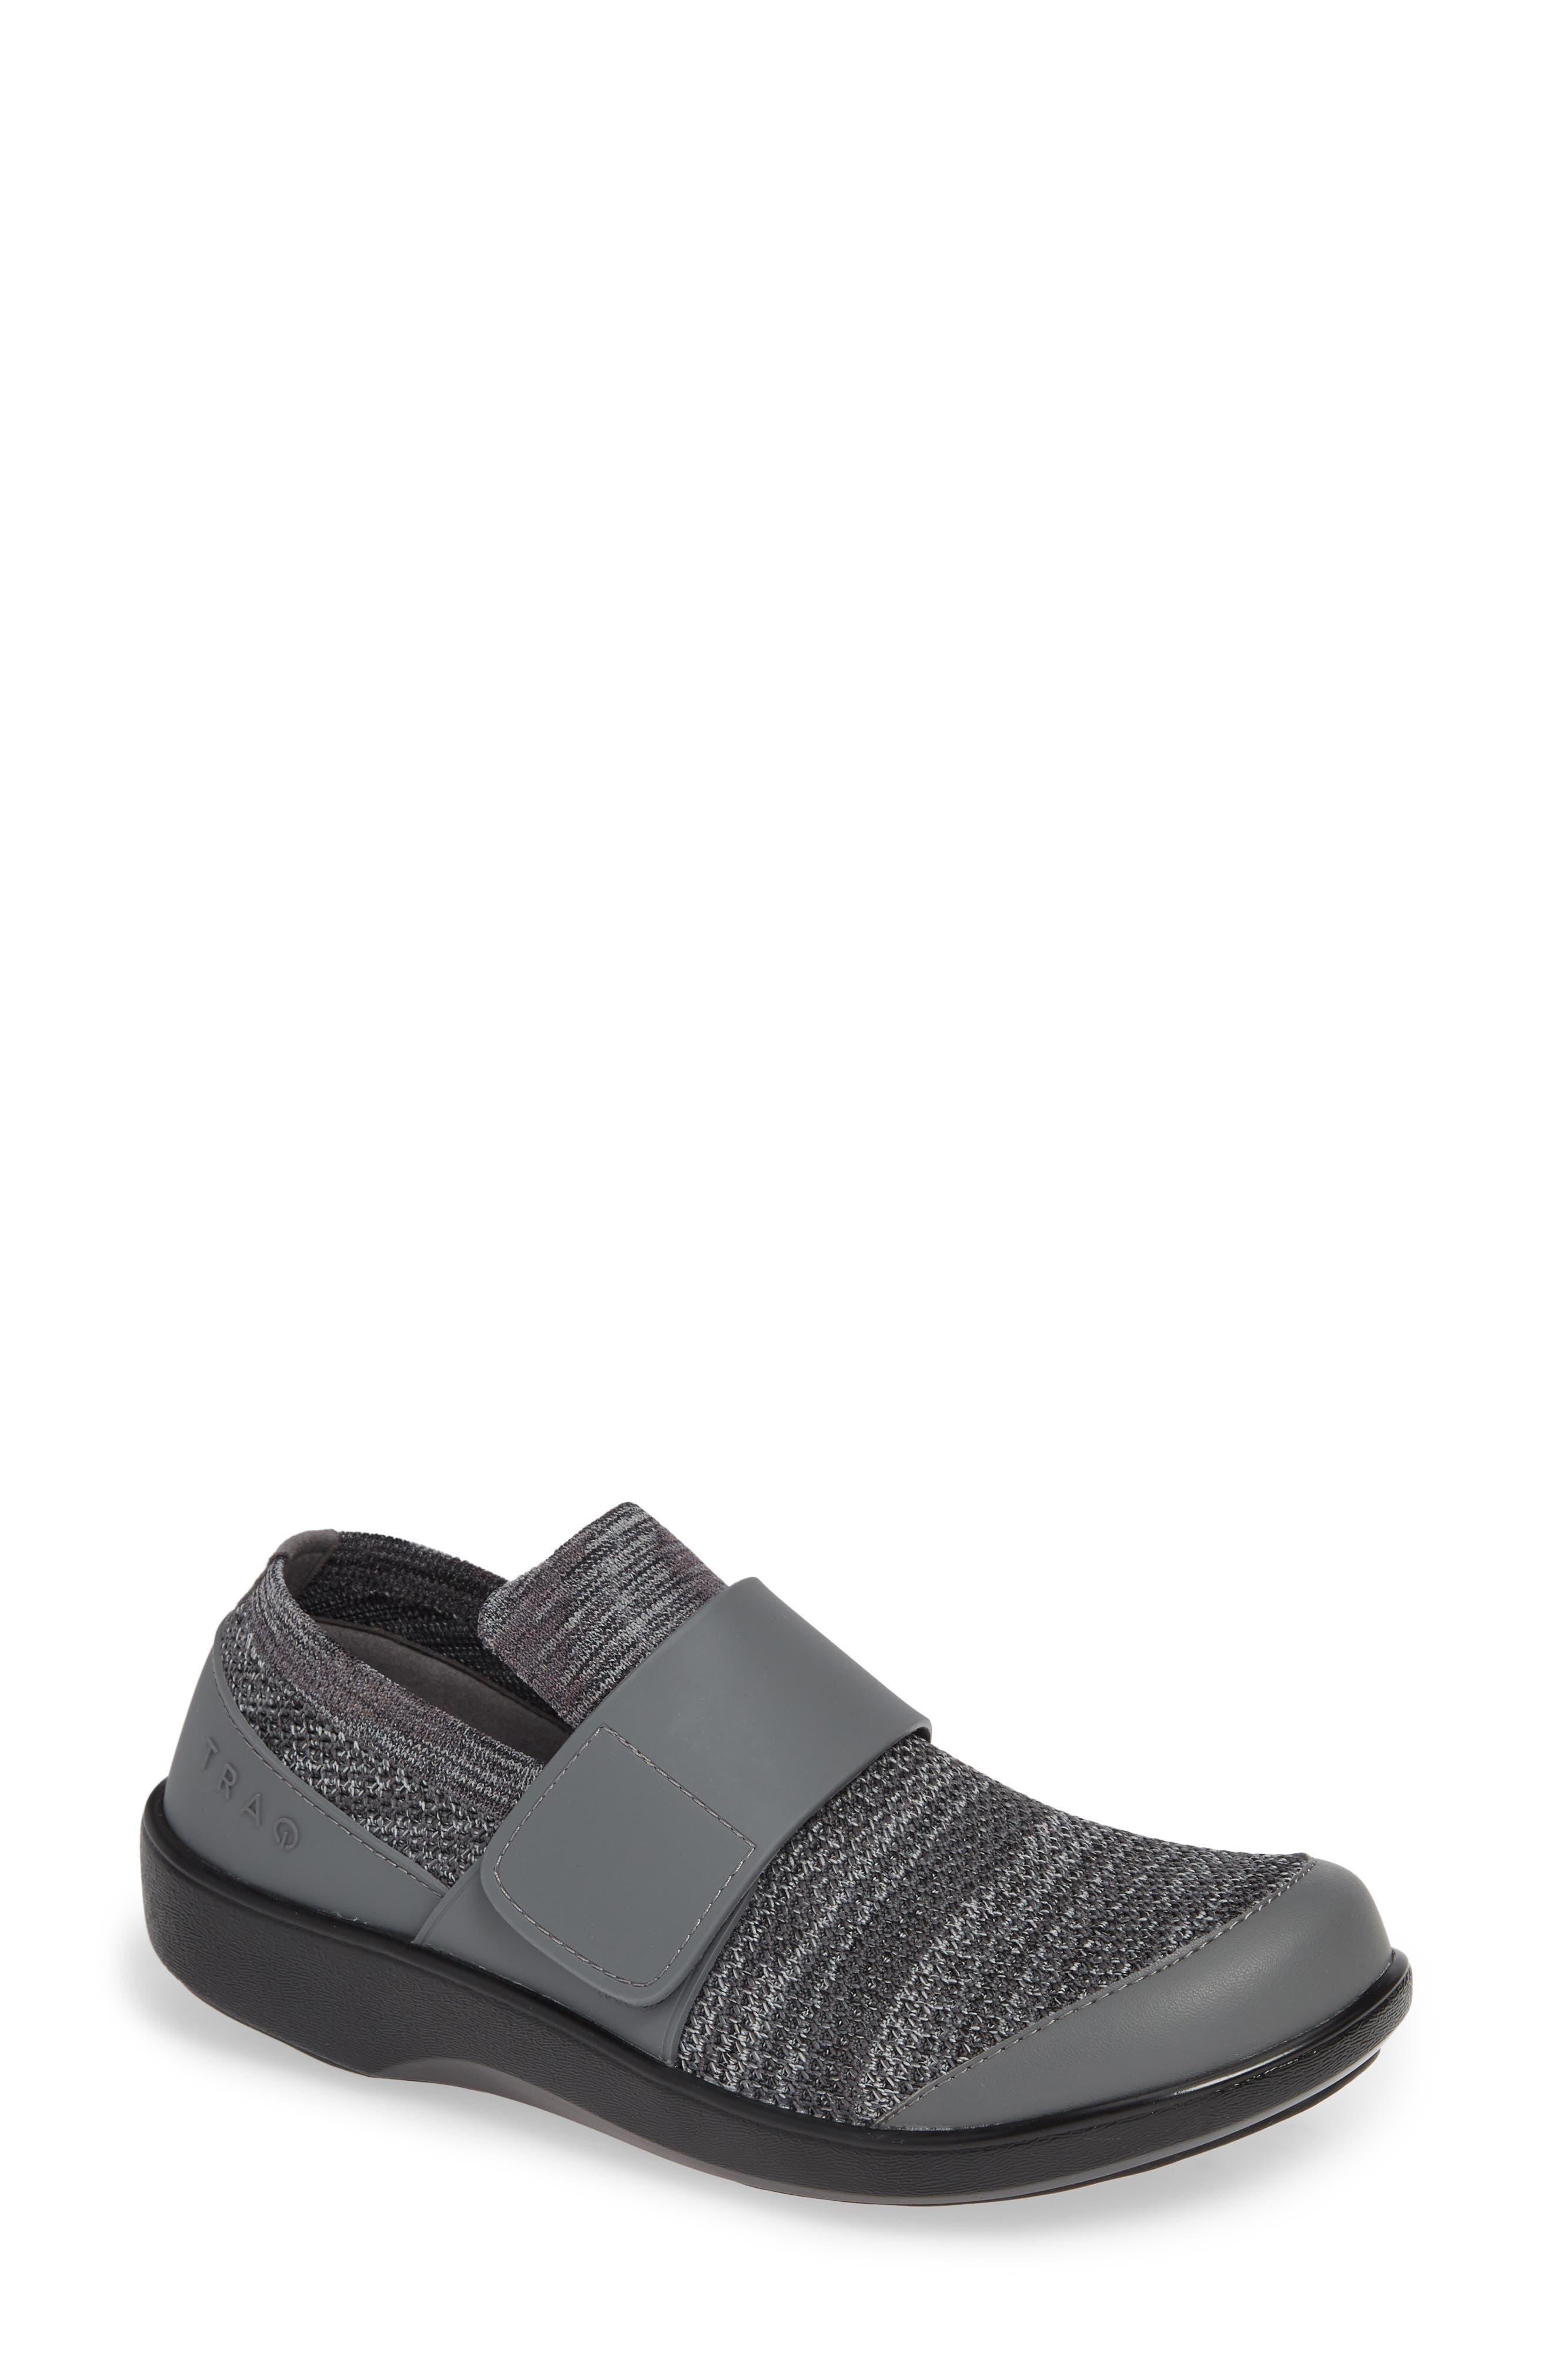 Alegria Qwik Sneaker, Grey